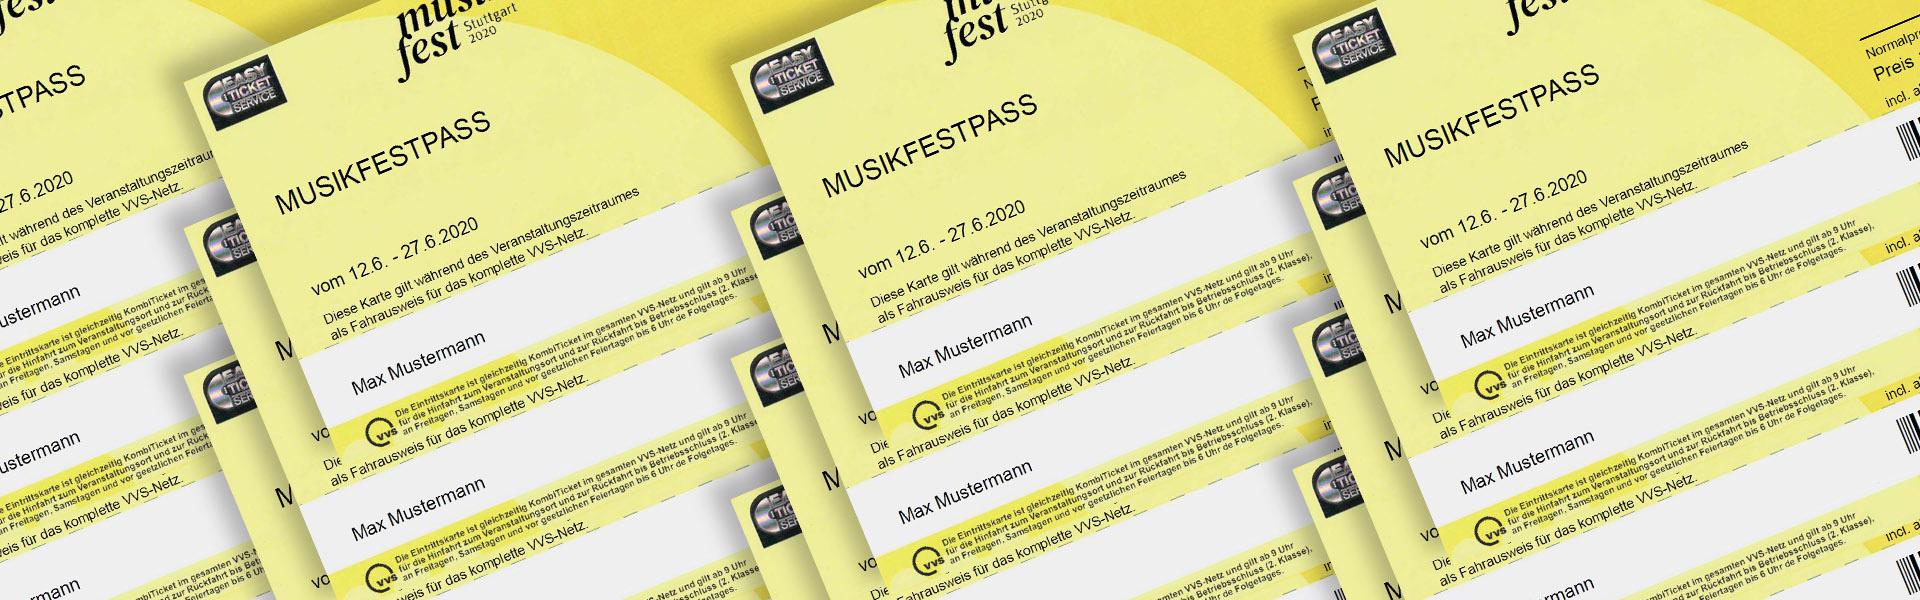 Spitzenmäßig: der Musikfest-Pass